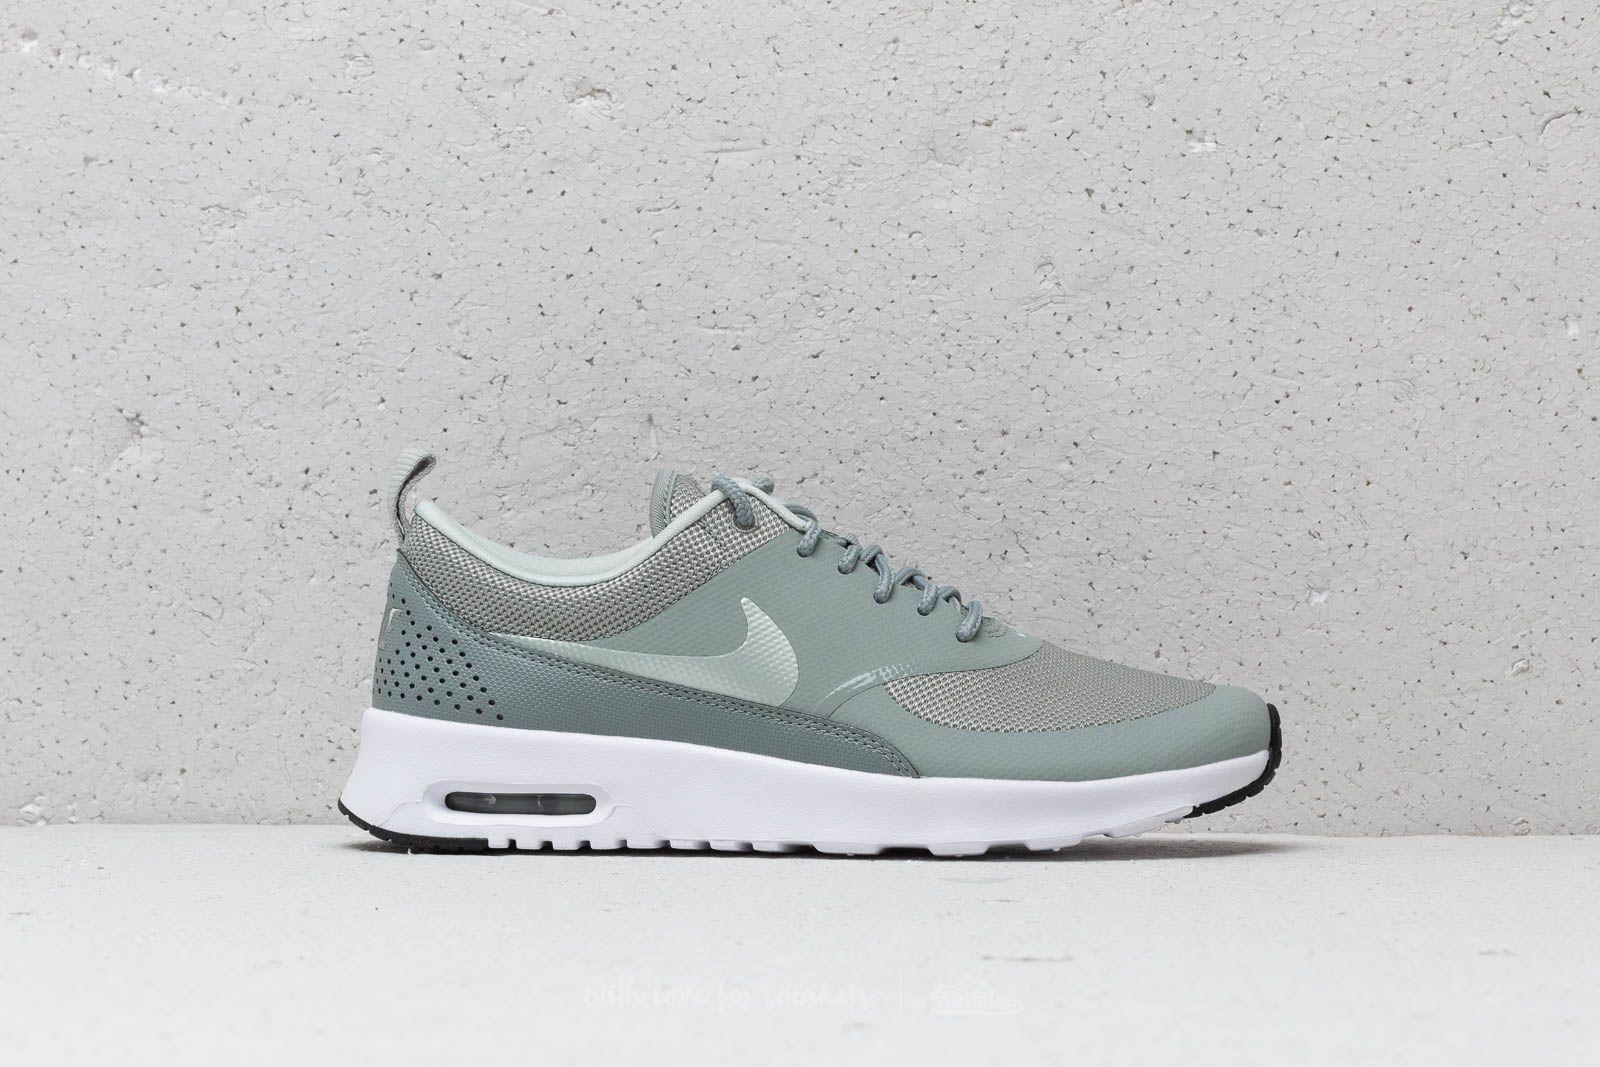 Nike WMNS Air Max Thea Mica Green Light Silver Black | Footshop